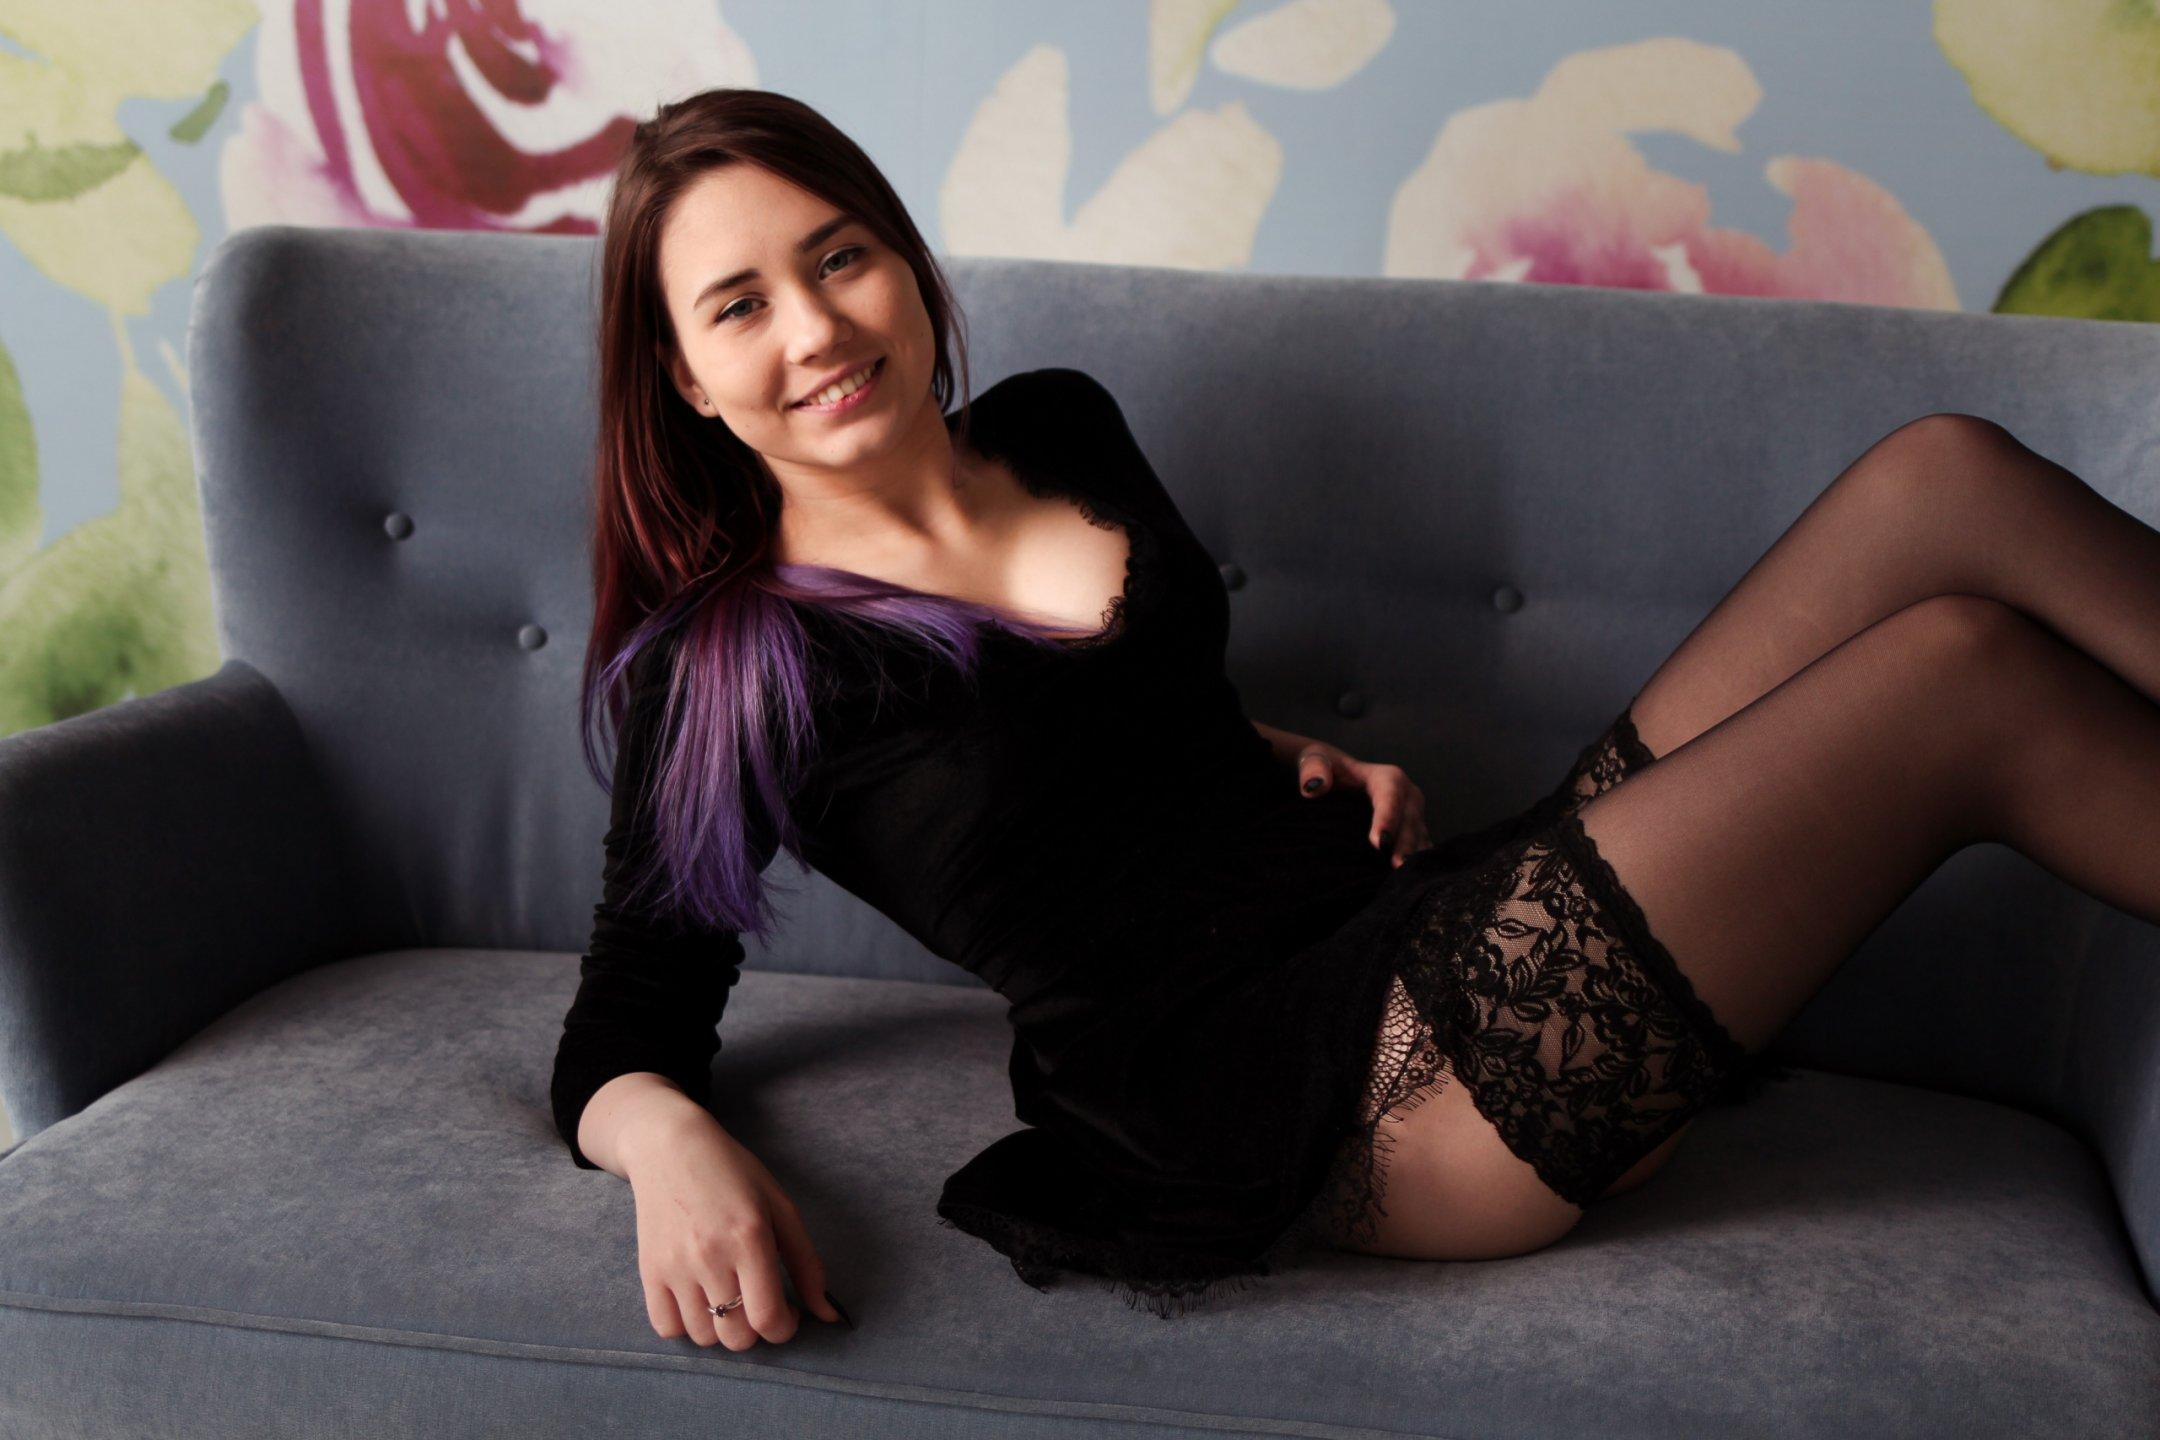 jeune Web cam sexe fille noire Hard Core Porn